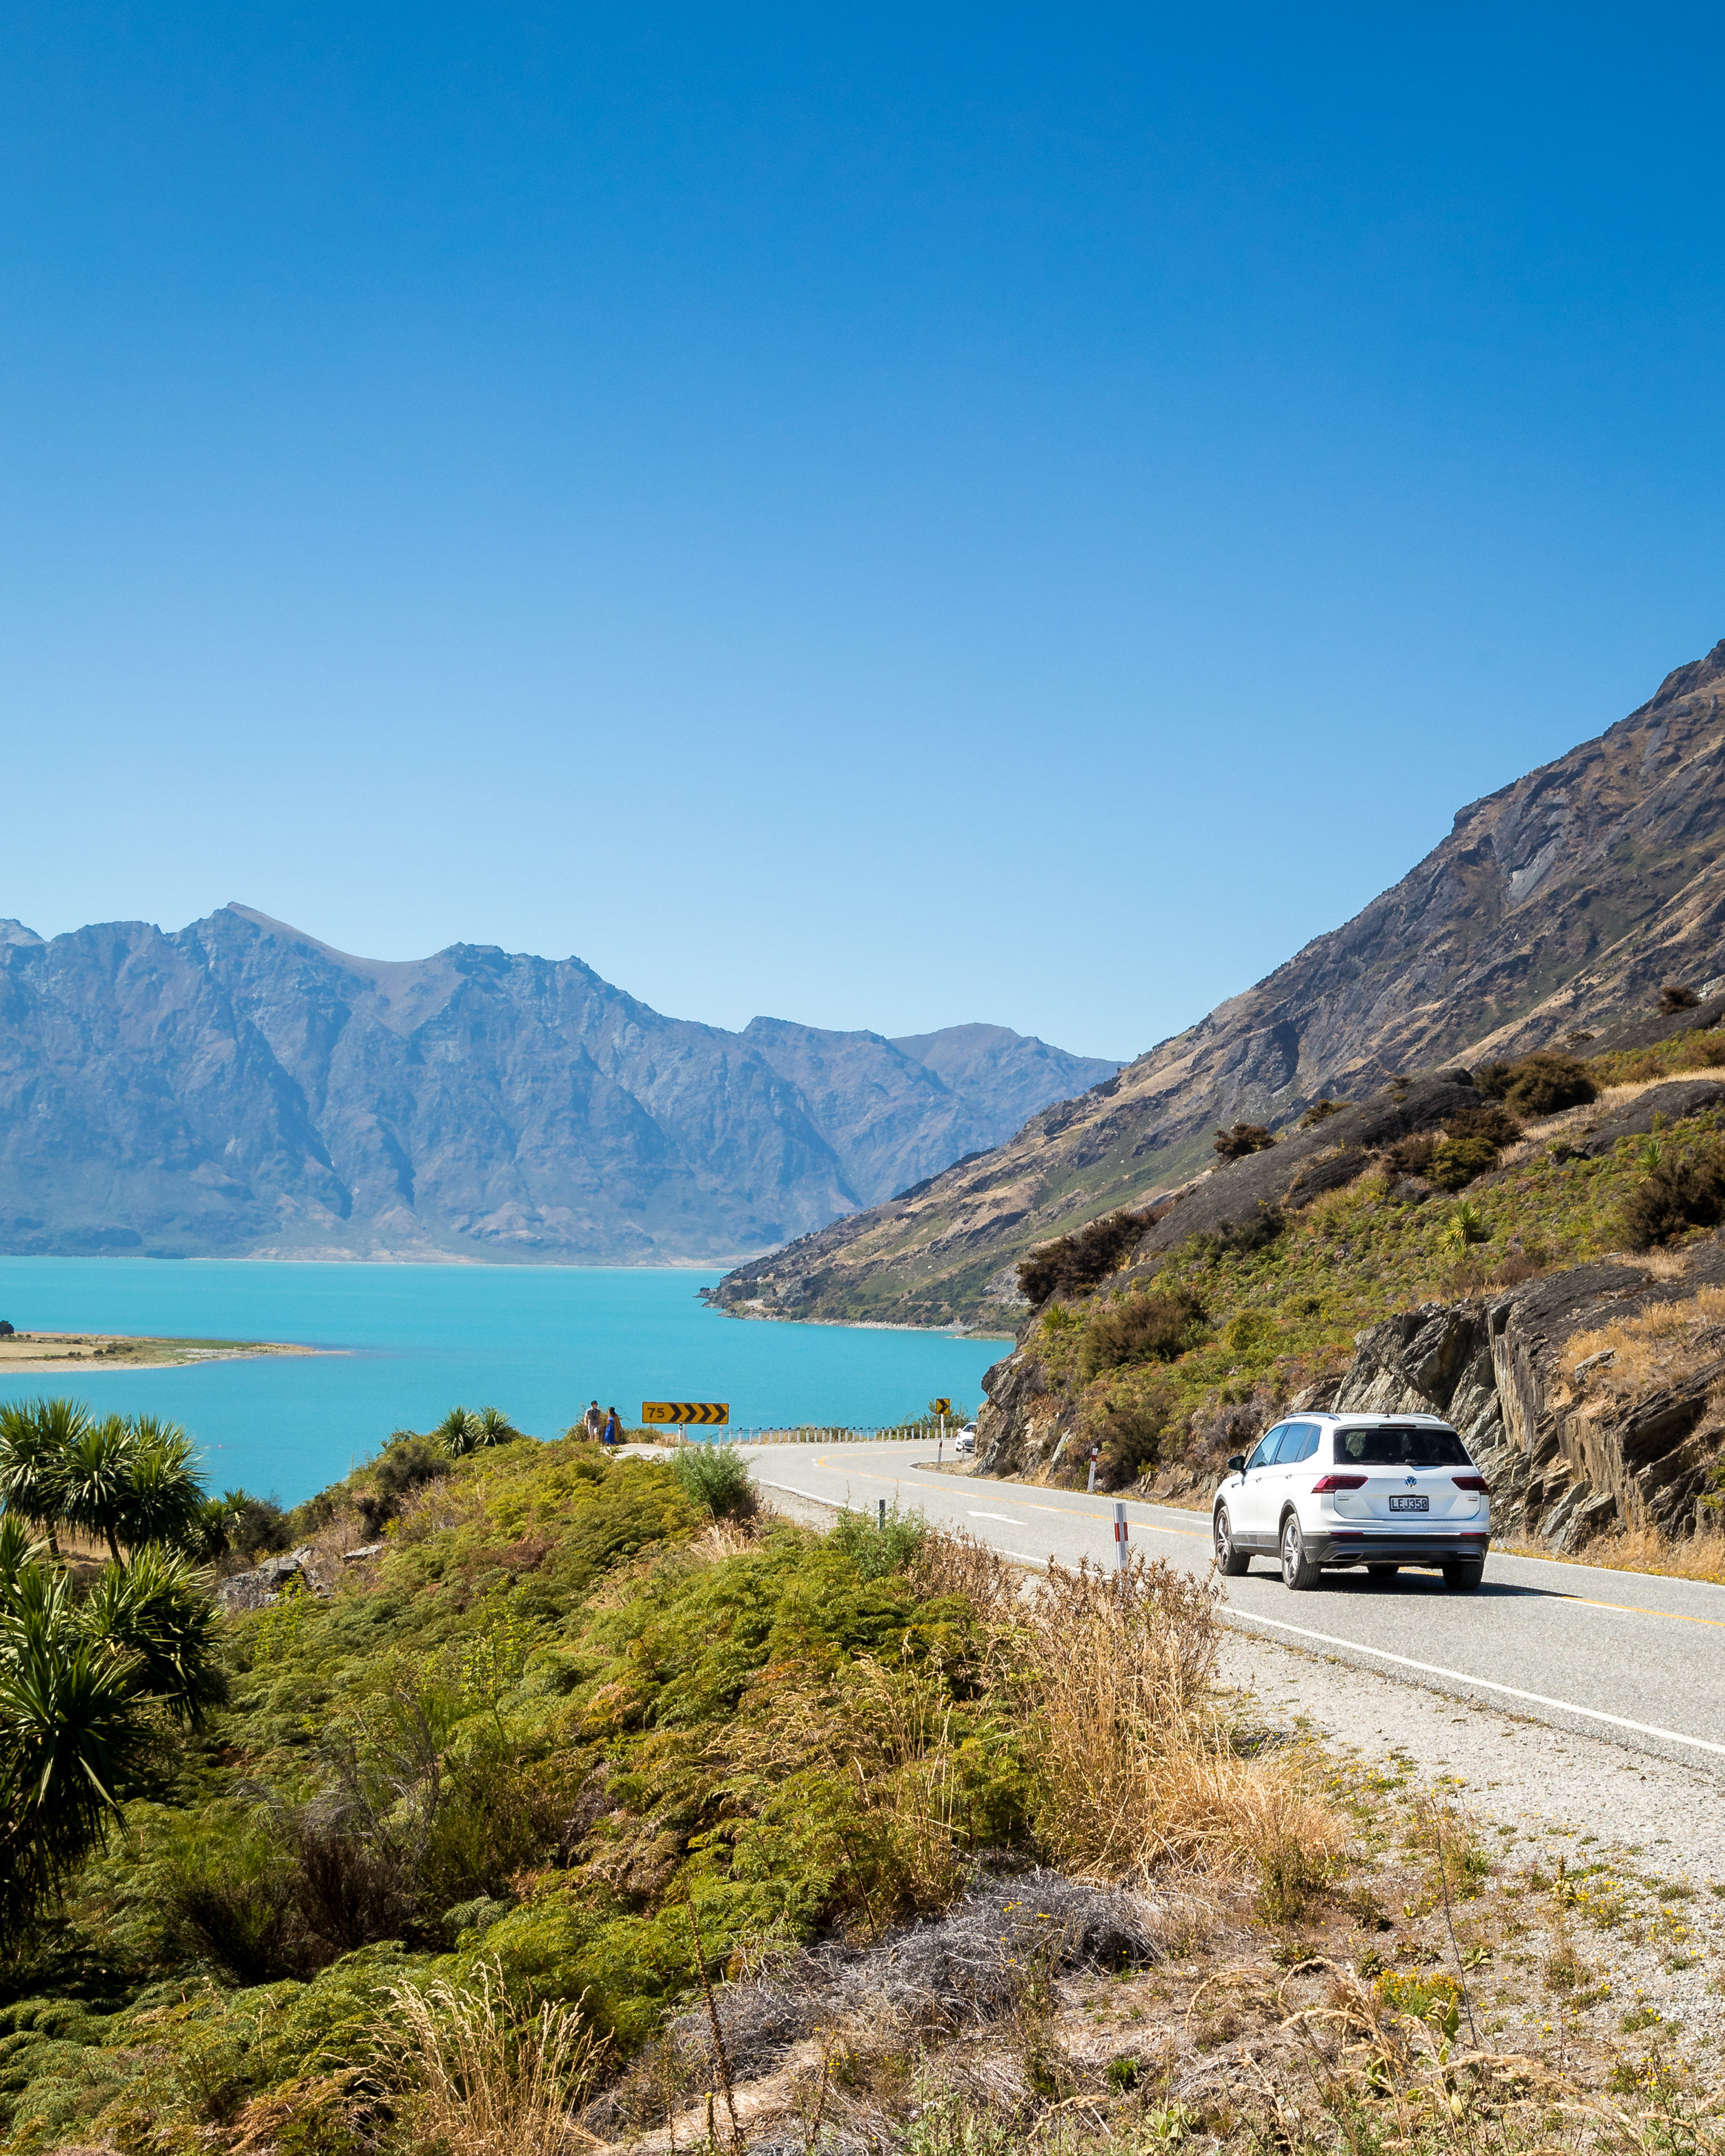 2 week New Zealand South Island Itinerary: Wanaka